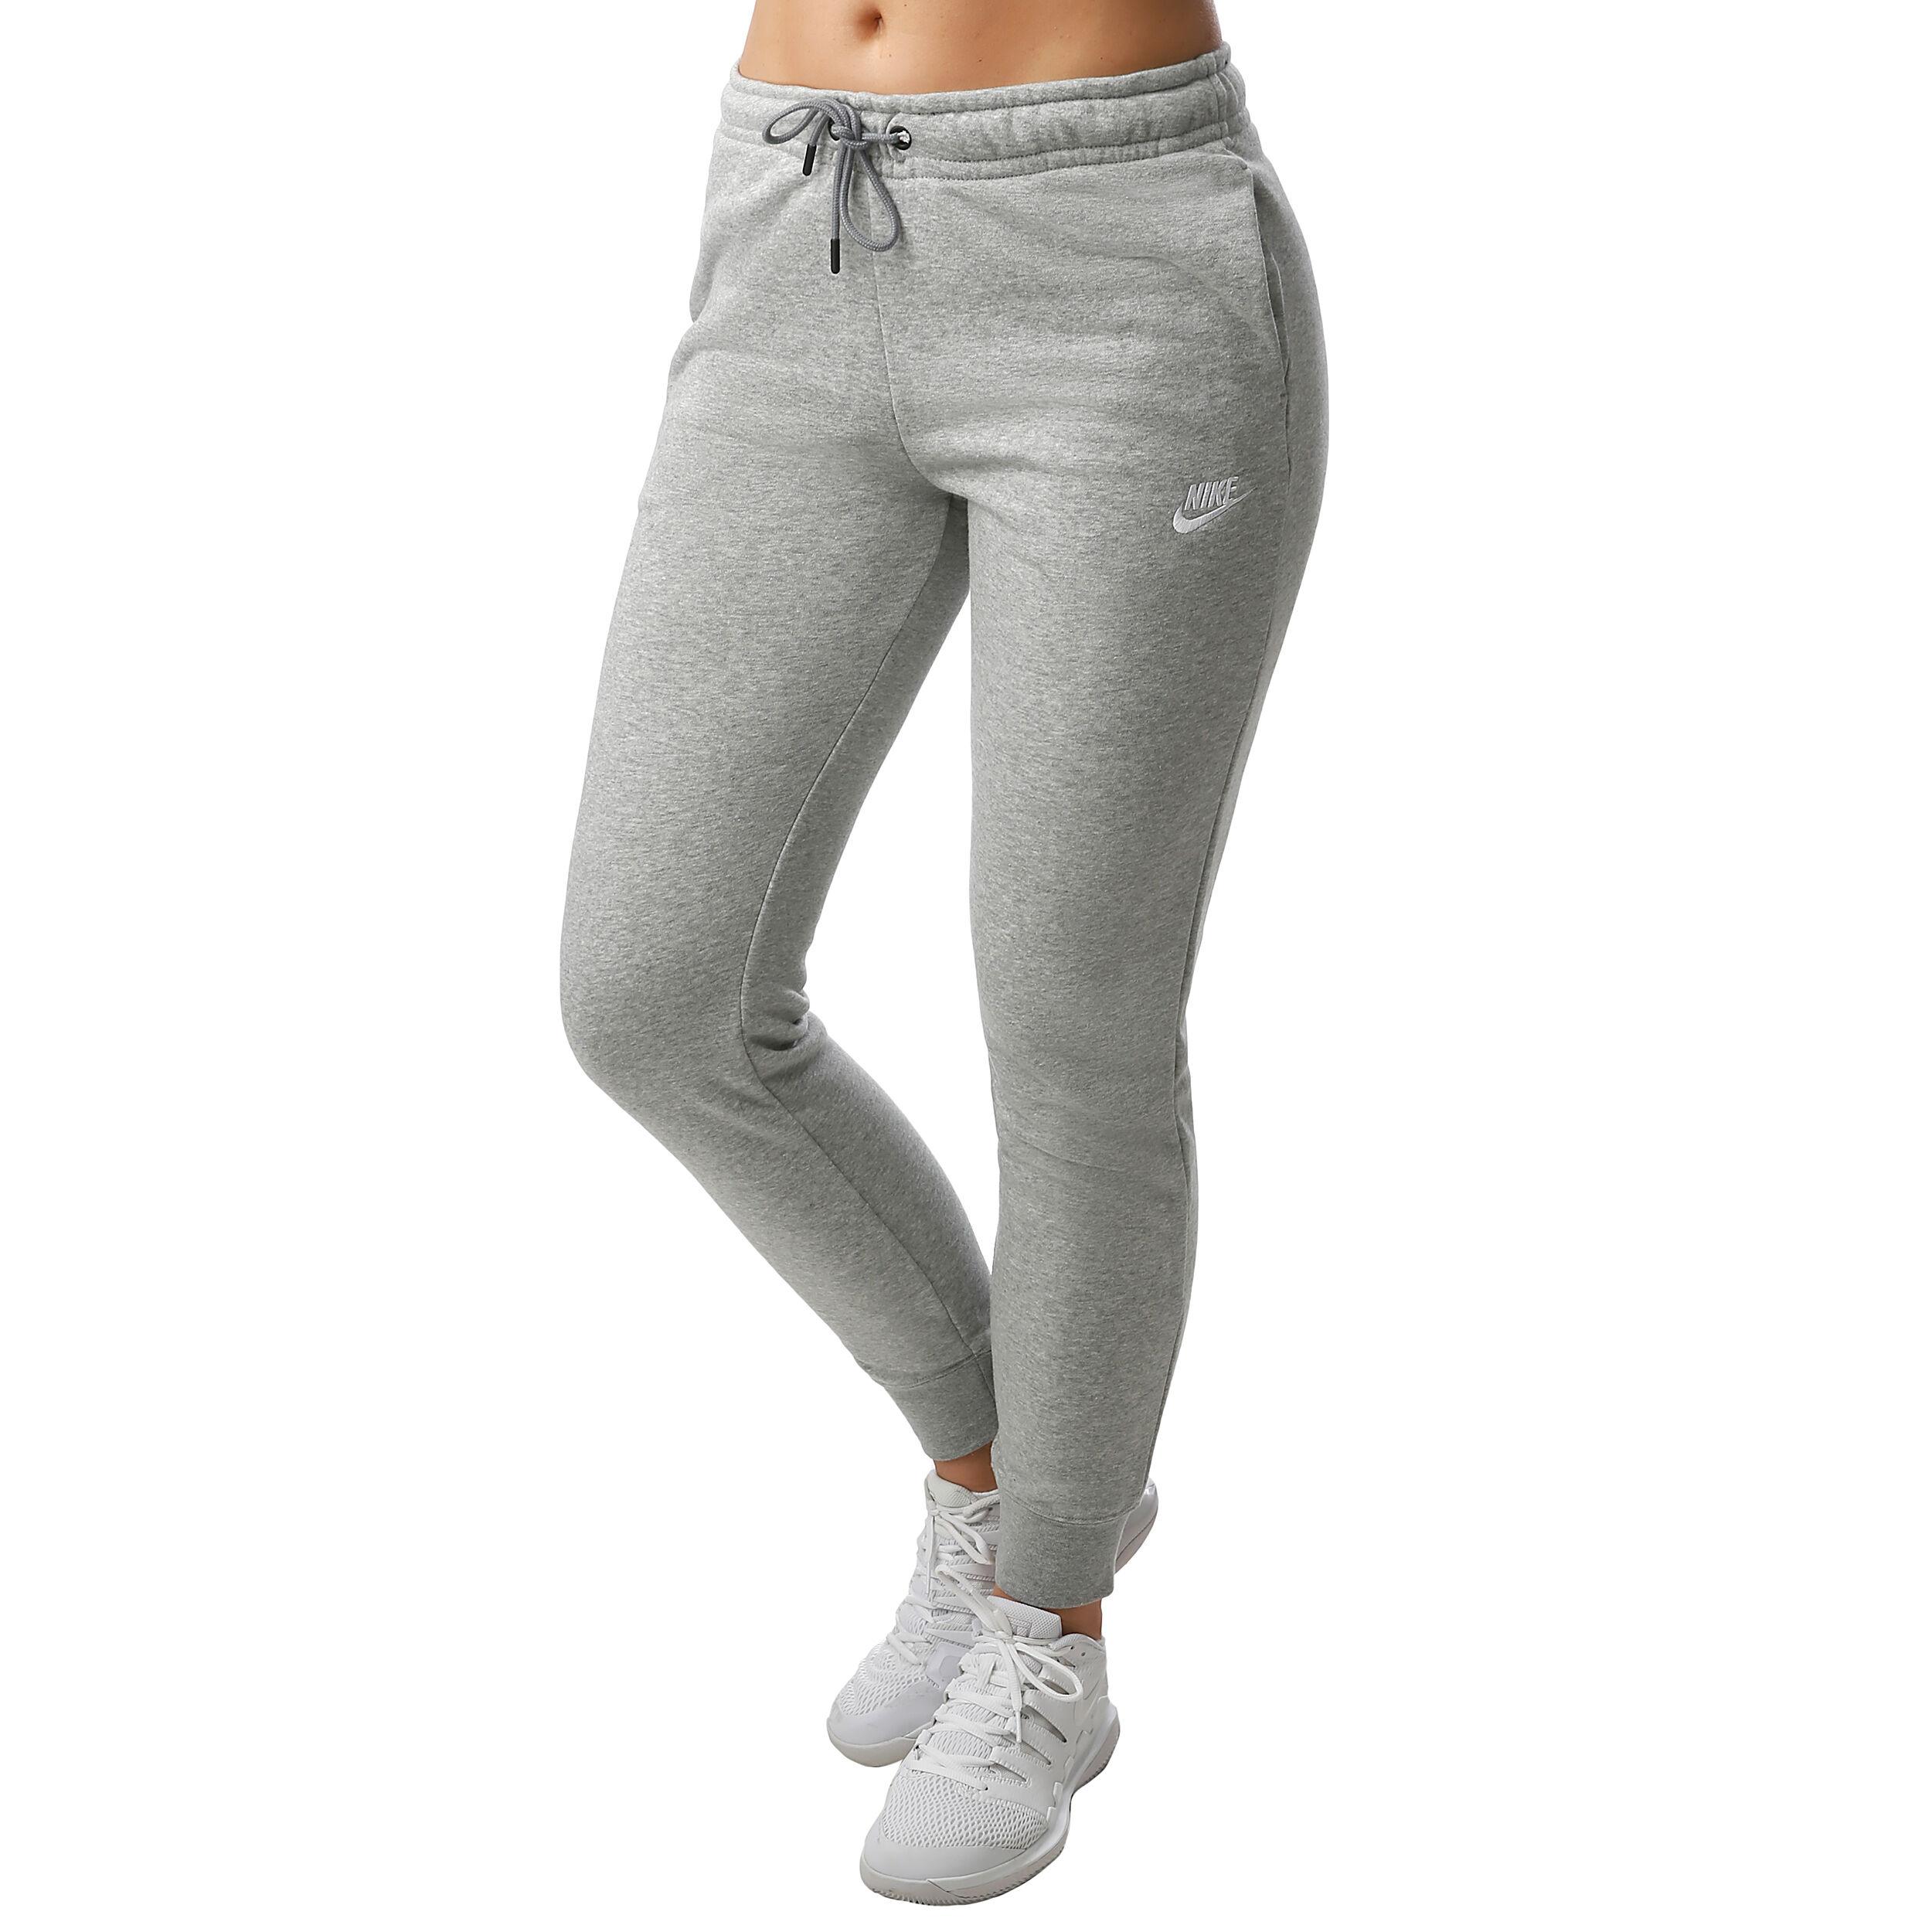 Sportswear Essential Fleece Træningsbukser Damer Lysegrå, Hvid